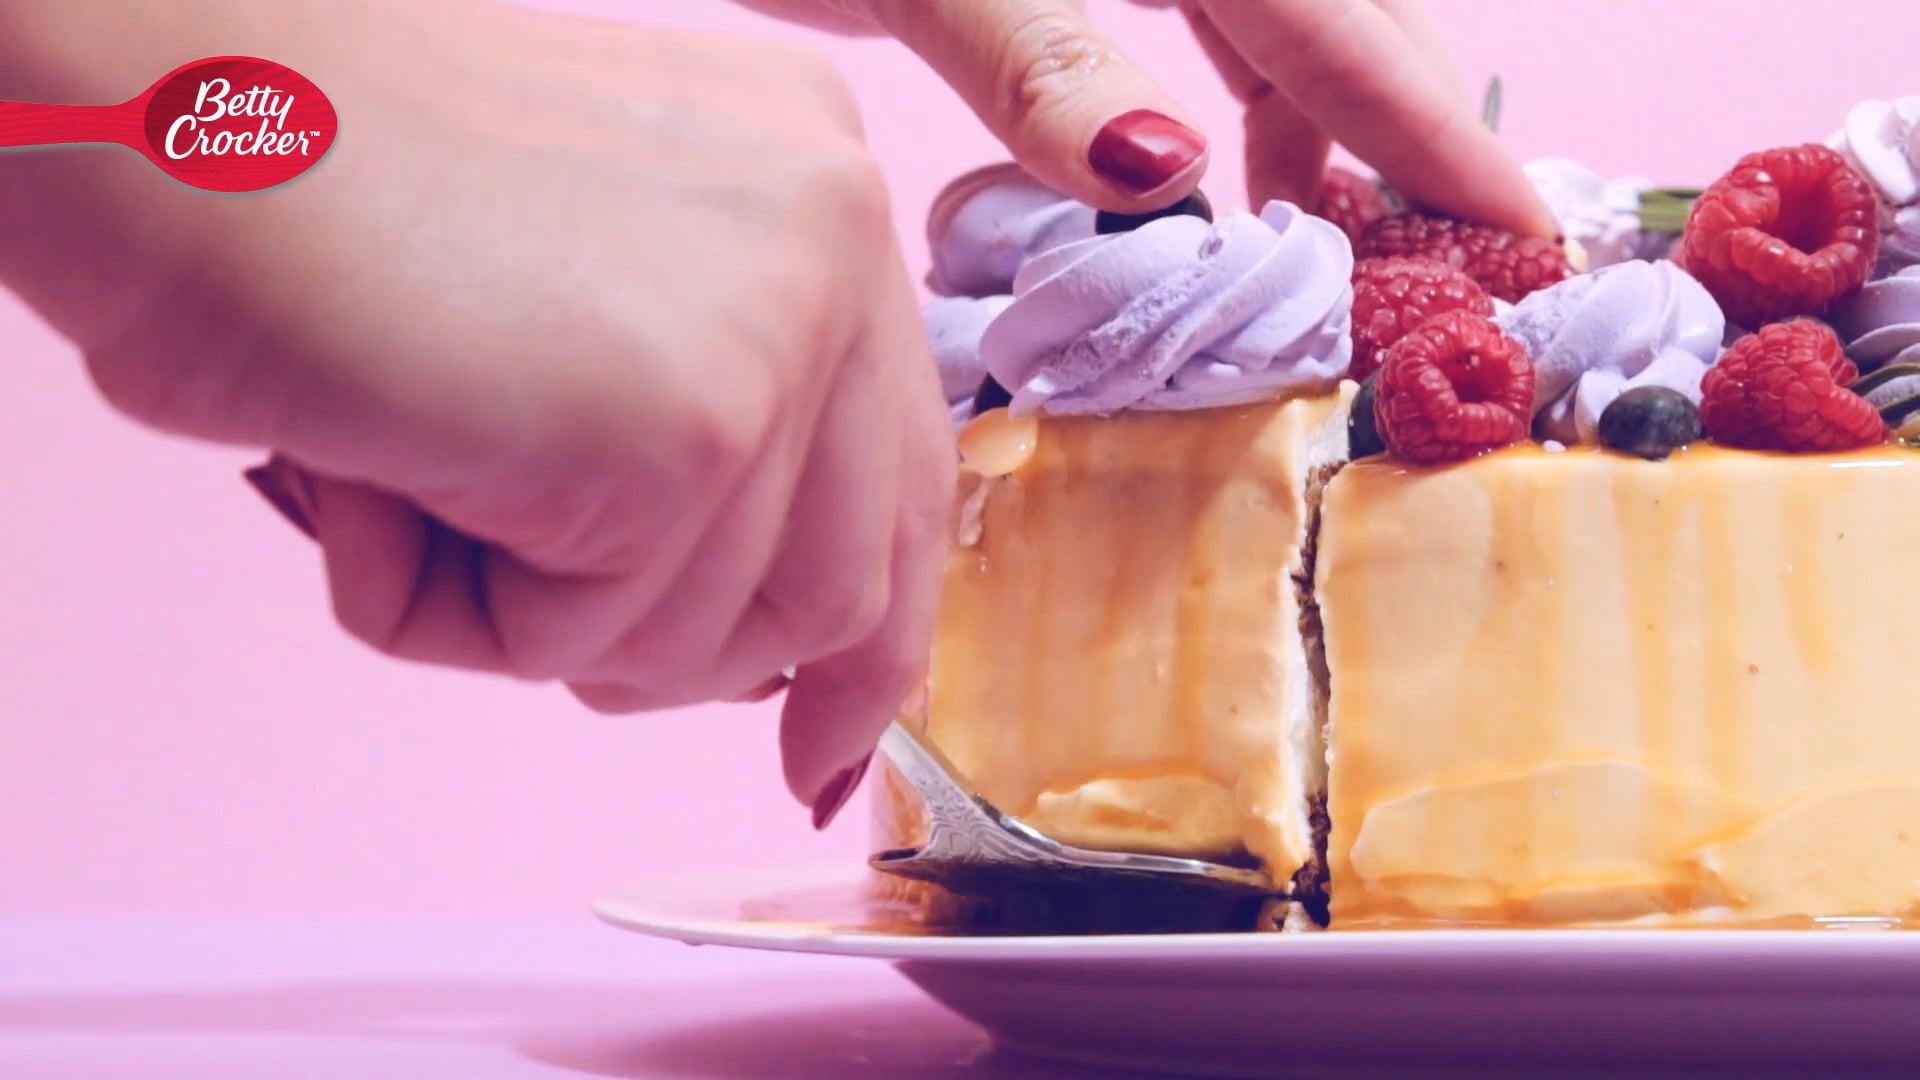 Betty Crocker Valentines Cake Animation